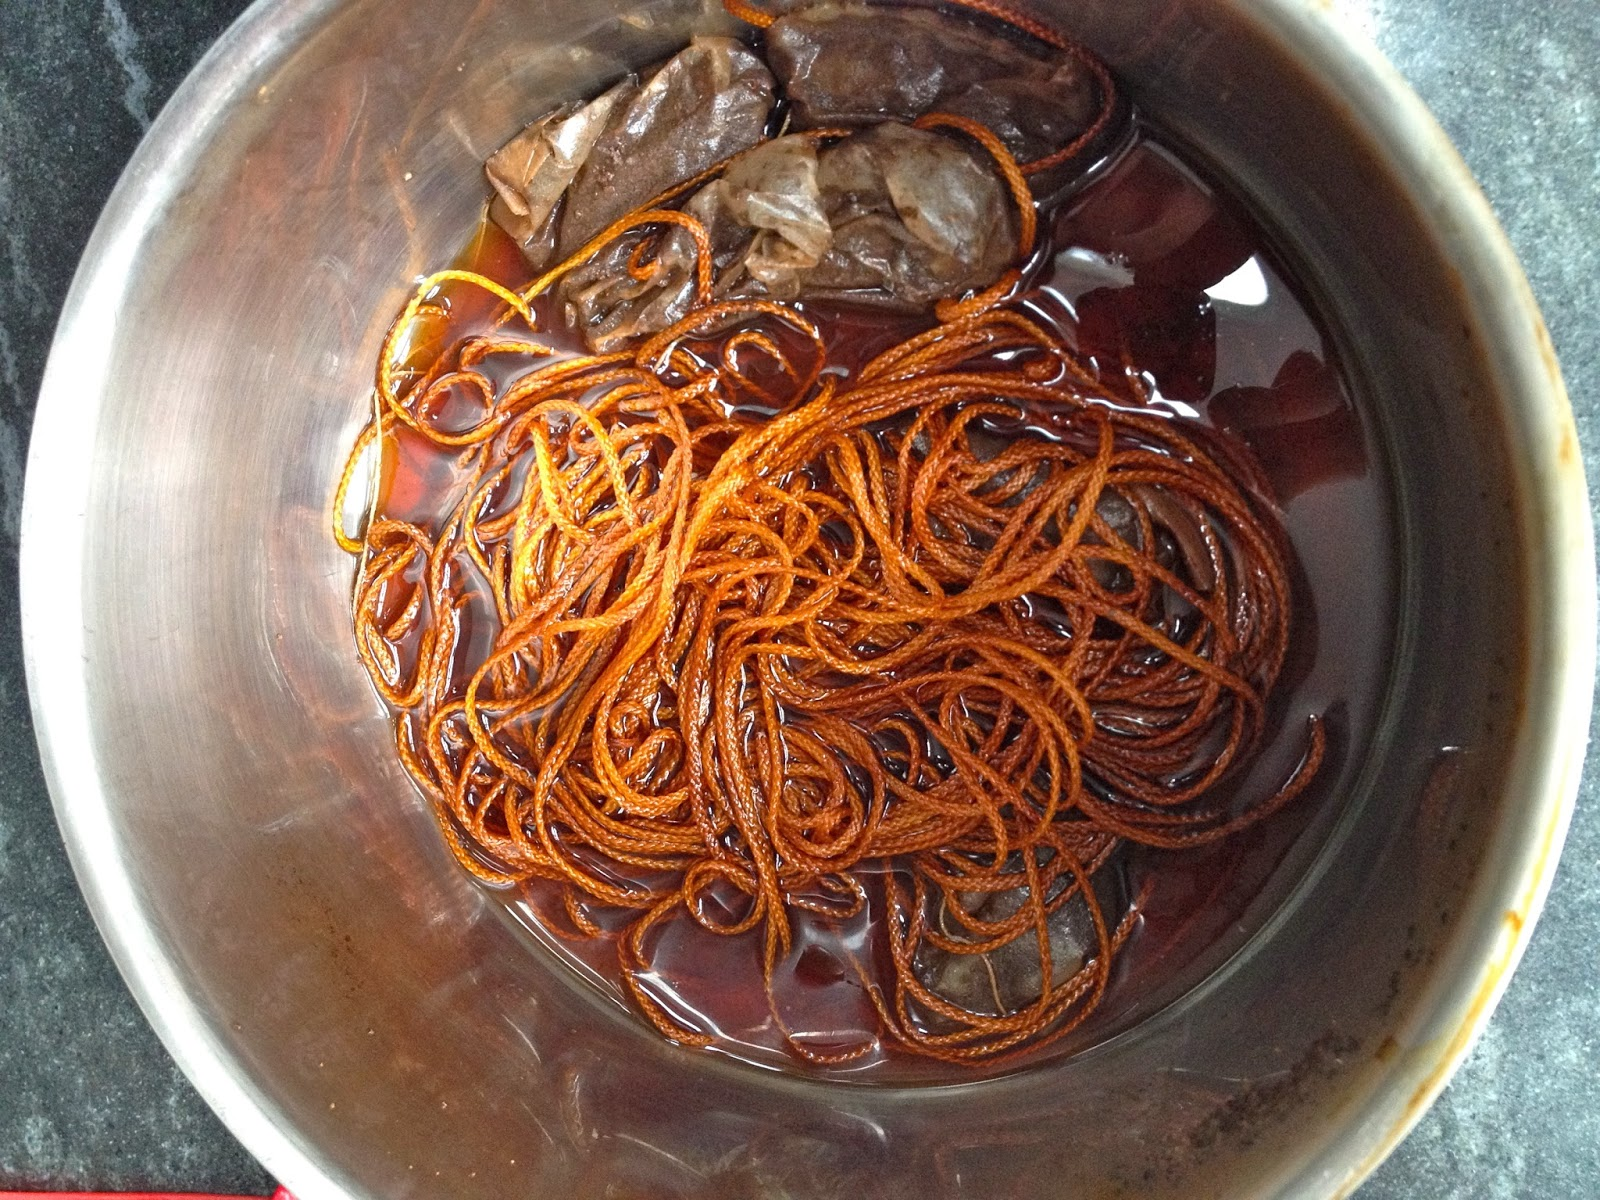 dye cording for roman shade